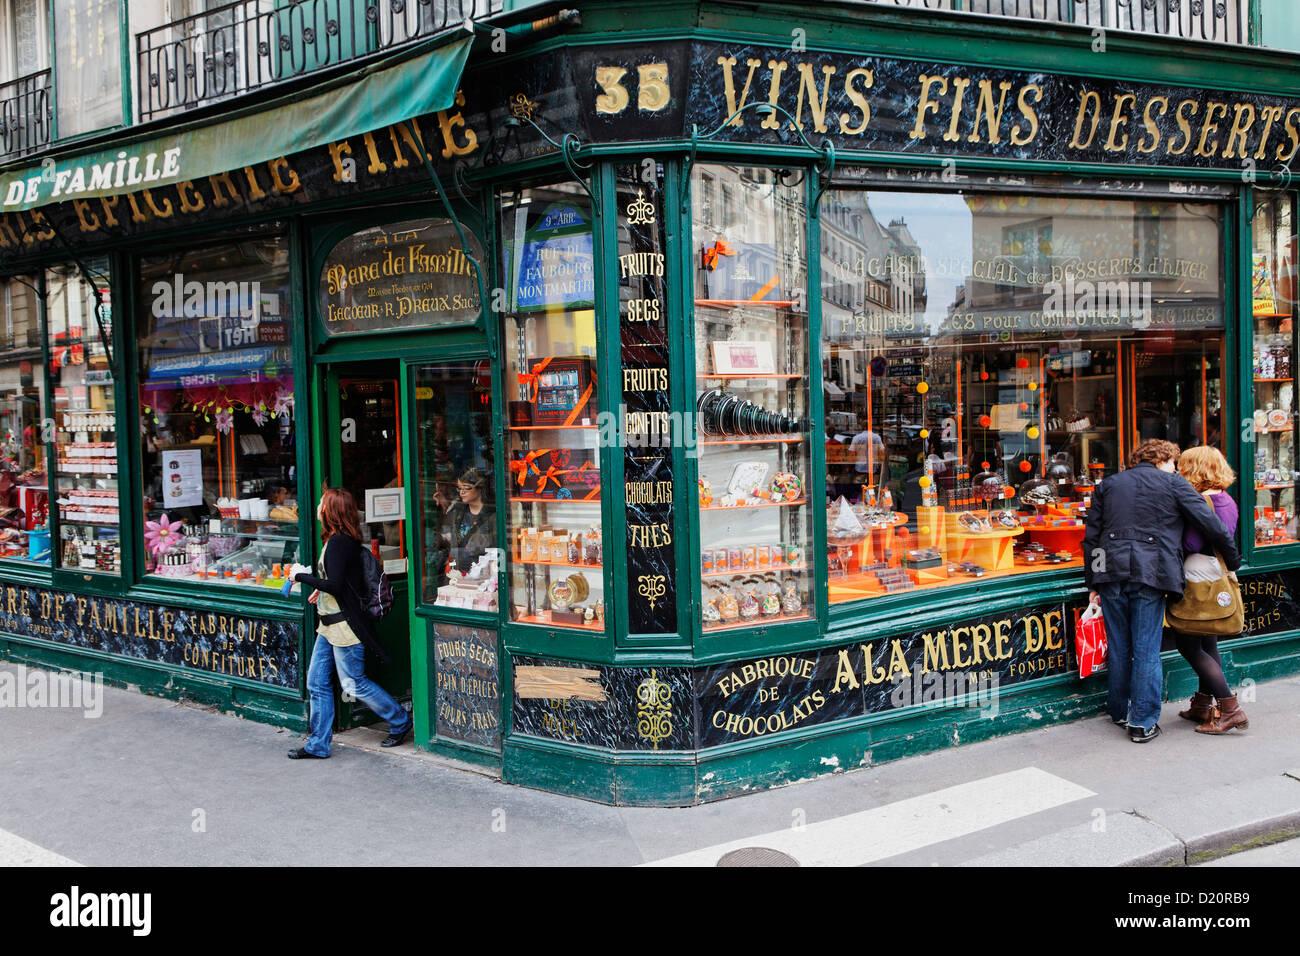 Facade of a delikatessen in Rue du Faubourg Montmartre, Paris, France, Europe - Stock Image